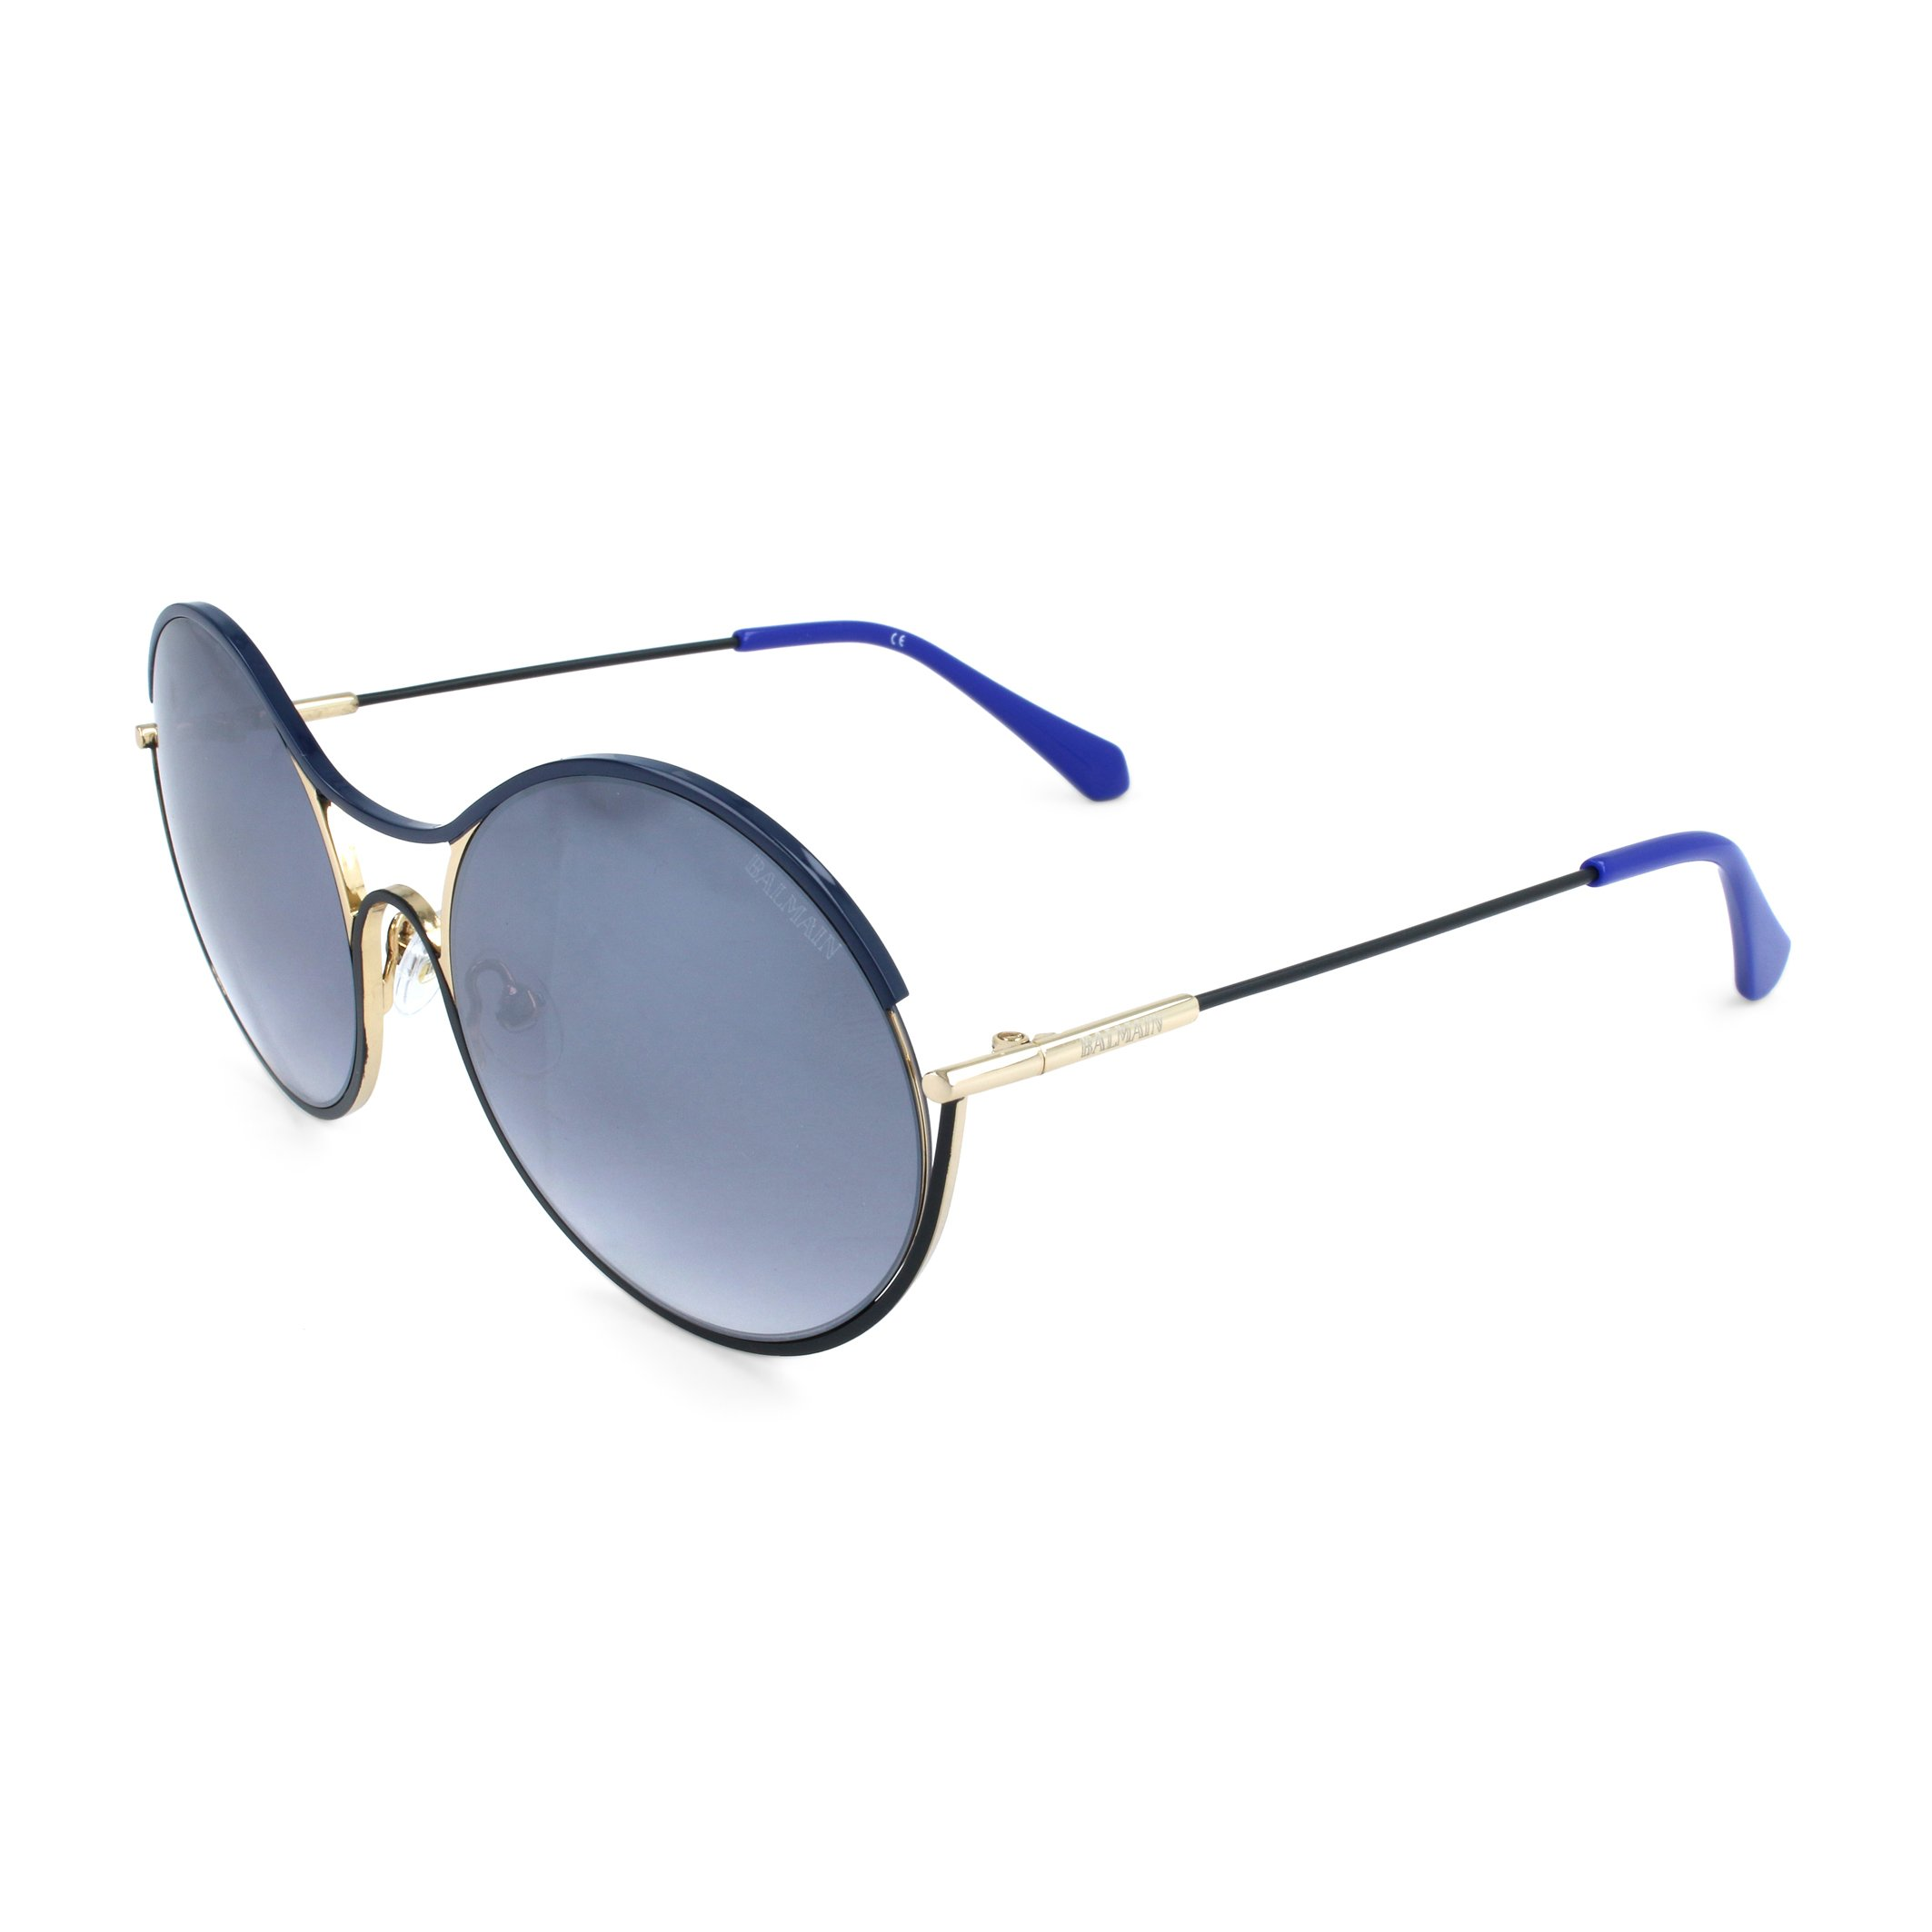 Balmain Women's Sunglasses Various Colours BL2520B - blue-1 NOSIZE